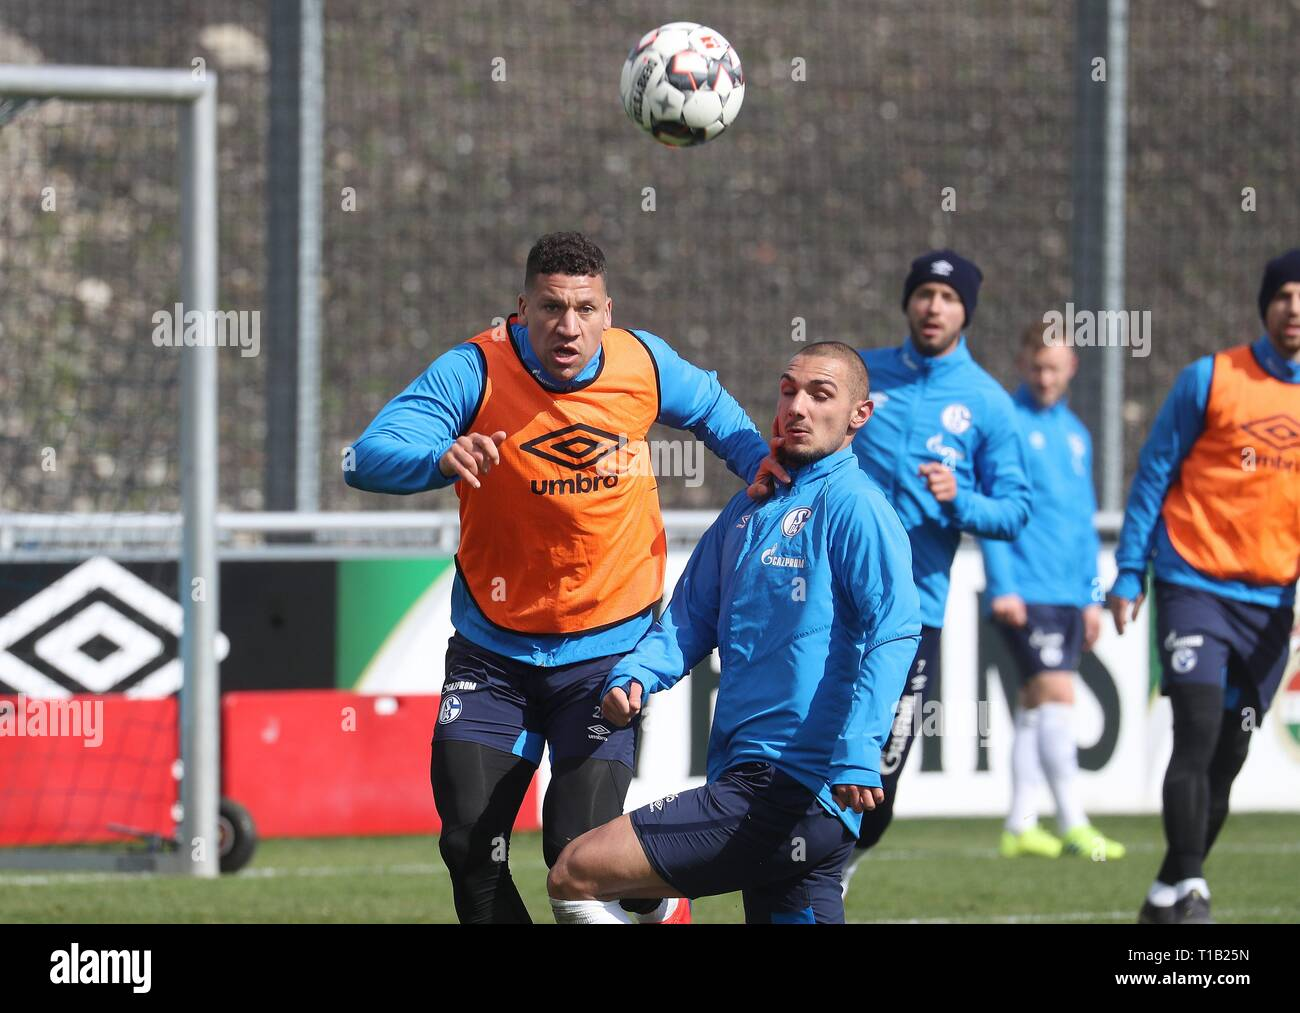 firo: 25.03.2019, Football, 2018/2019, 1.Bundesliga: FC Schalke 04 - Training duels Bruma versus Ahmed Kutucu   usage worldwide - Stock Image